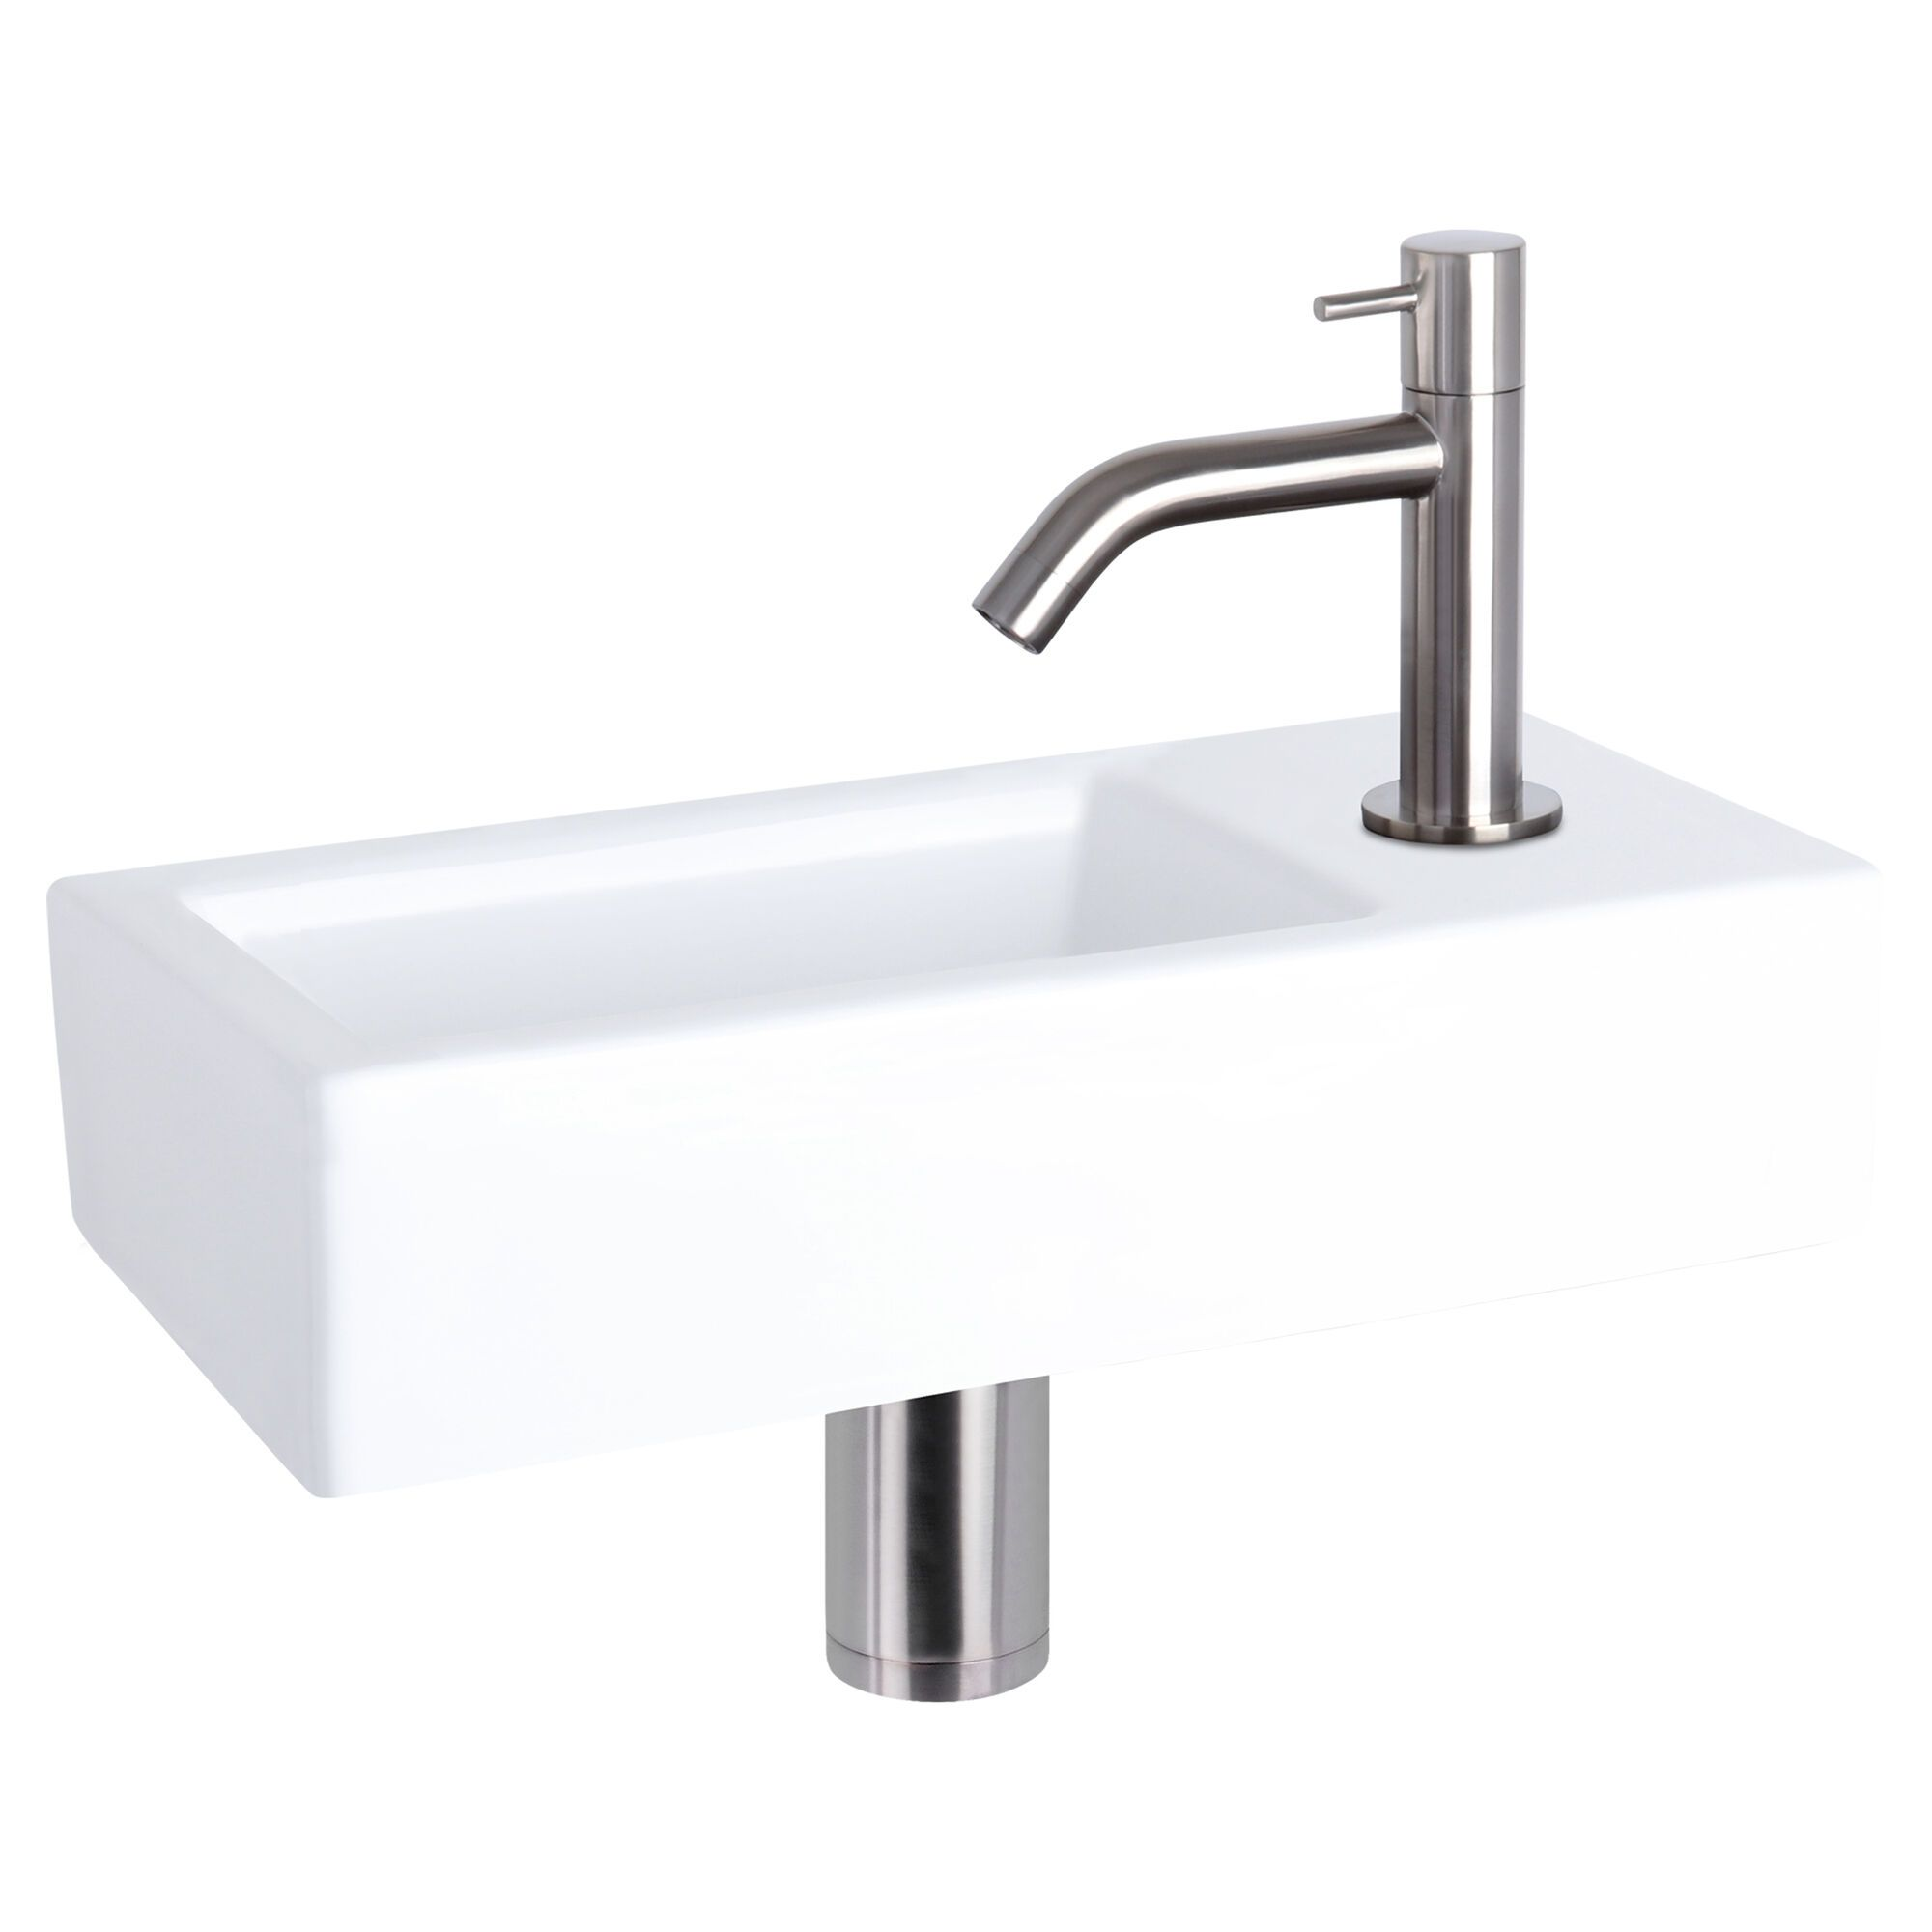 WC Fontein Hura Gebogen Kraan | Fonteinset Mat Wit met Chroom | Wastafel WC